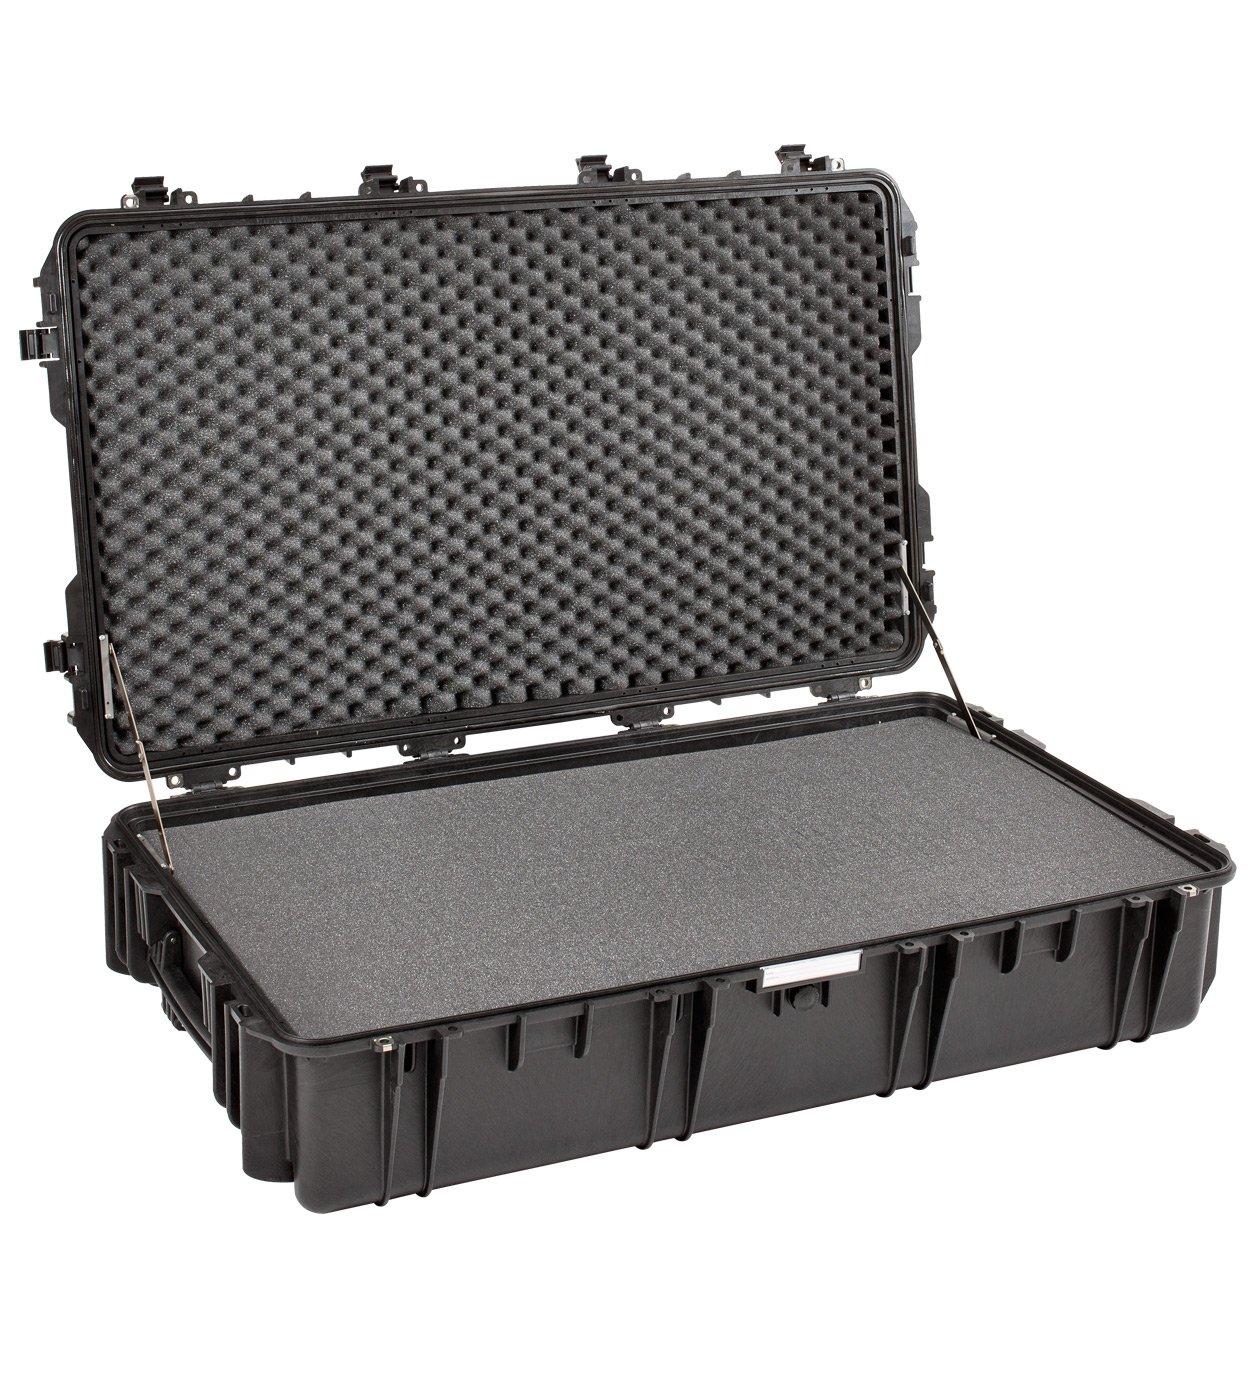 Explorer Cases 10826b multi-weaponsケース、ブラック、1サイズ   B01LCKGE7E